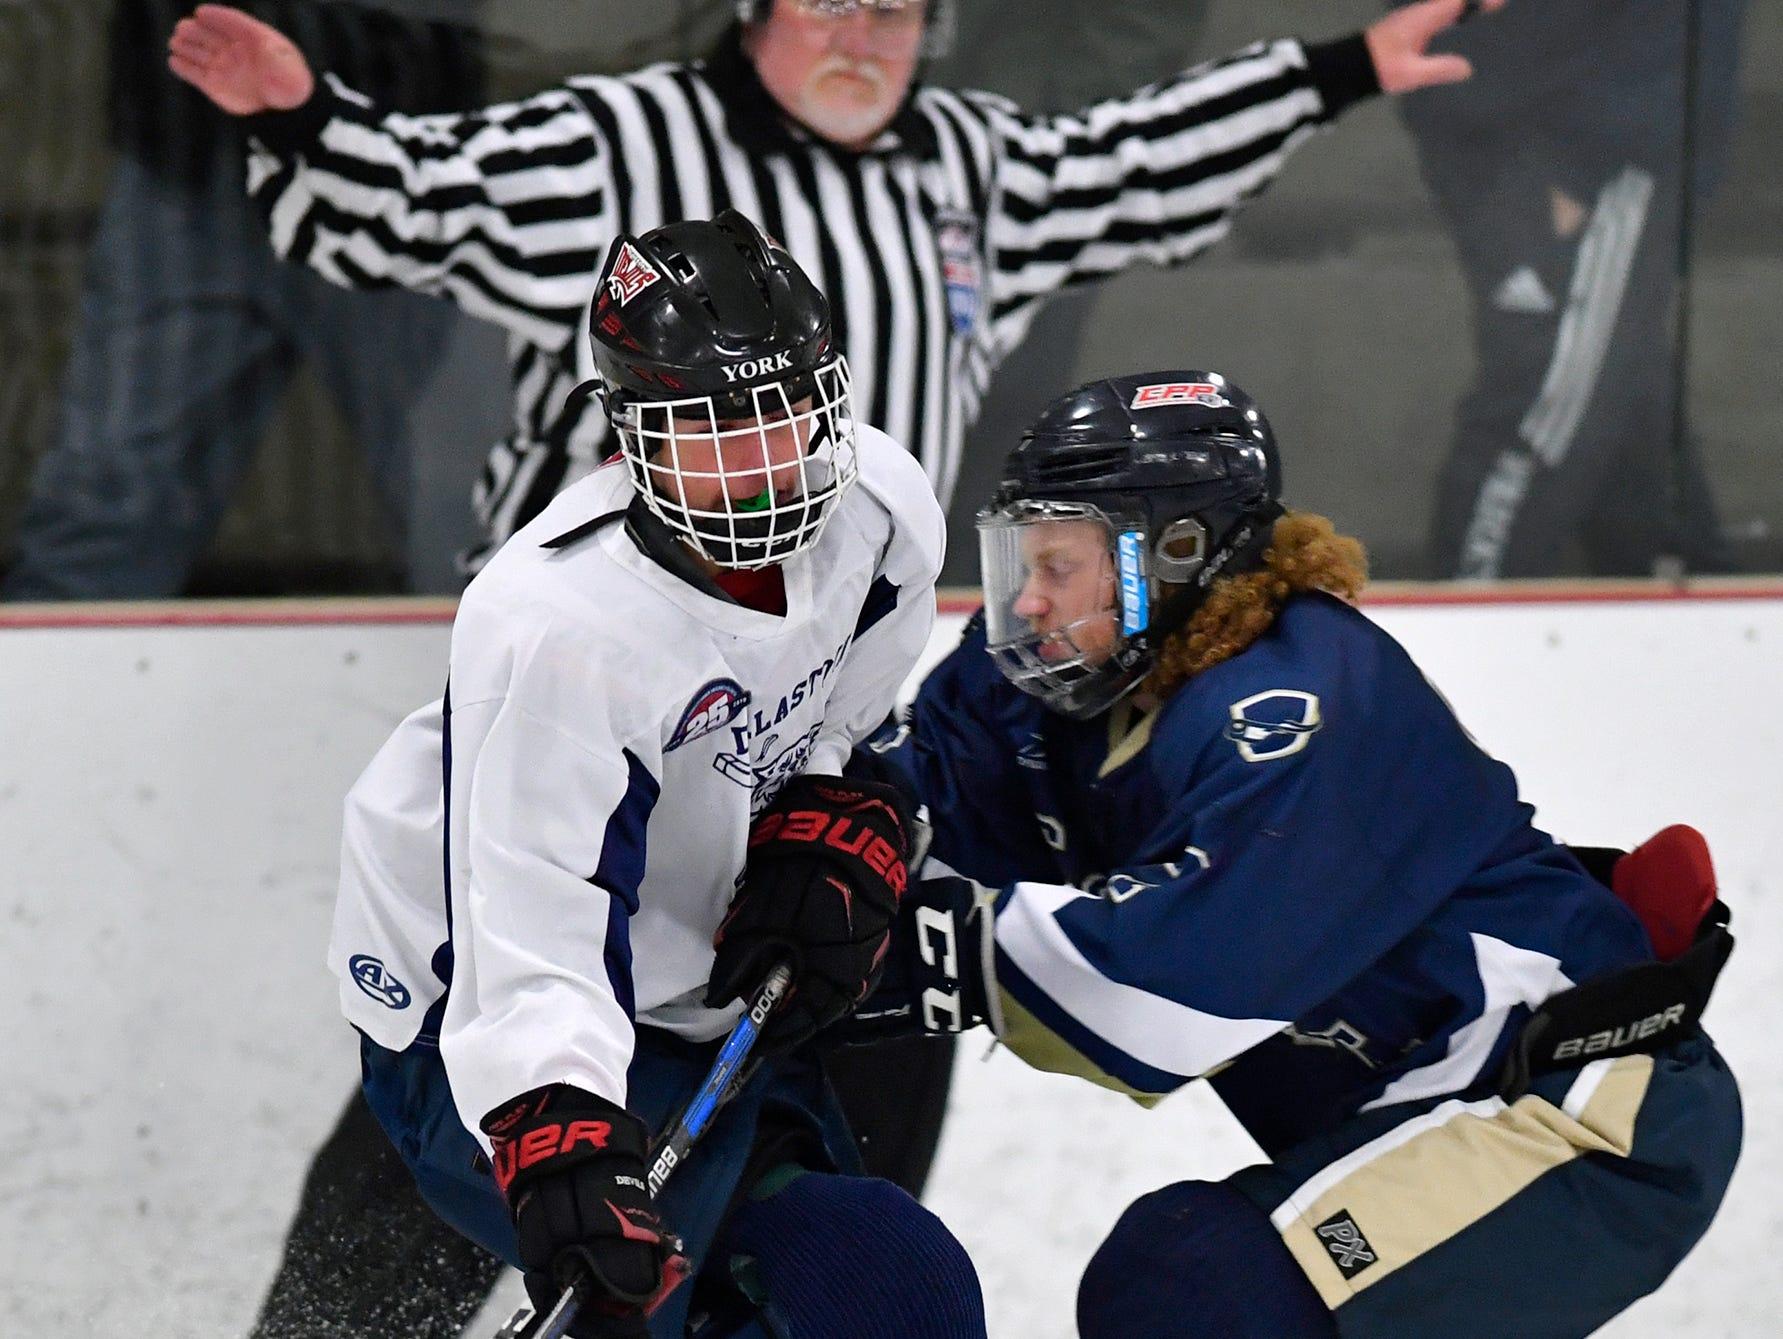 Dallastown vs Penn Manor ice hockey, Monday, November 26, 2018.John A. Pavoncello photo